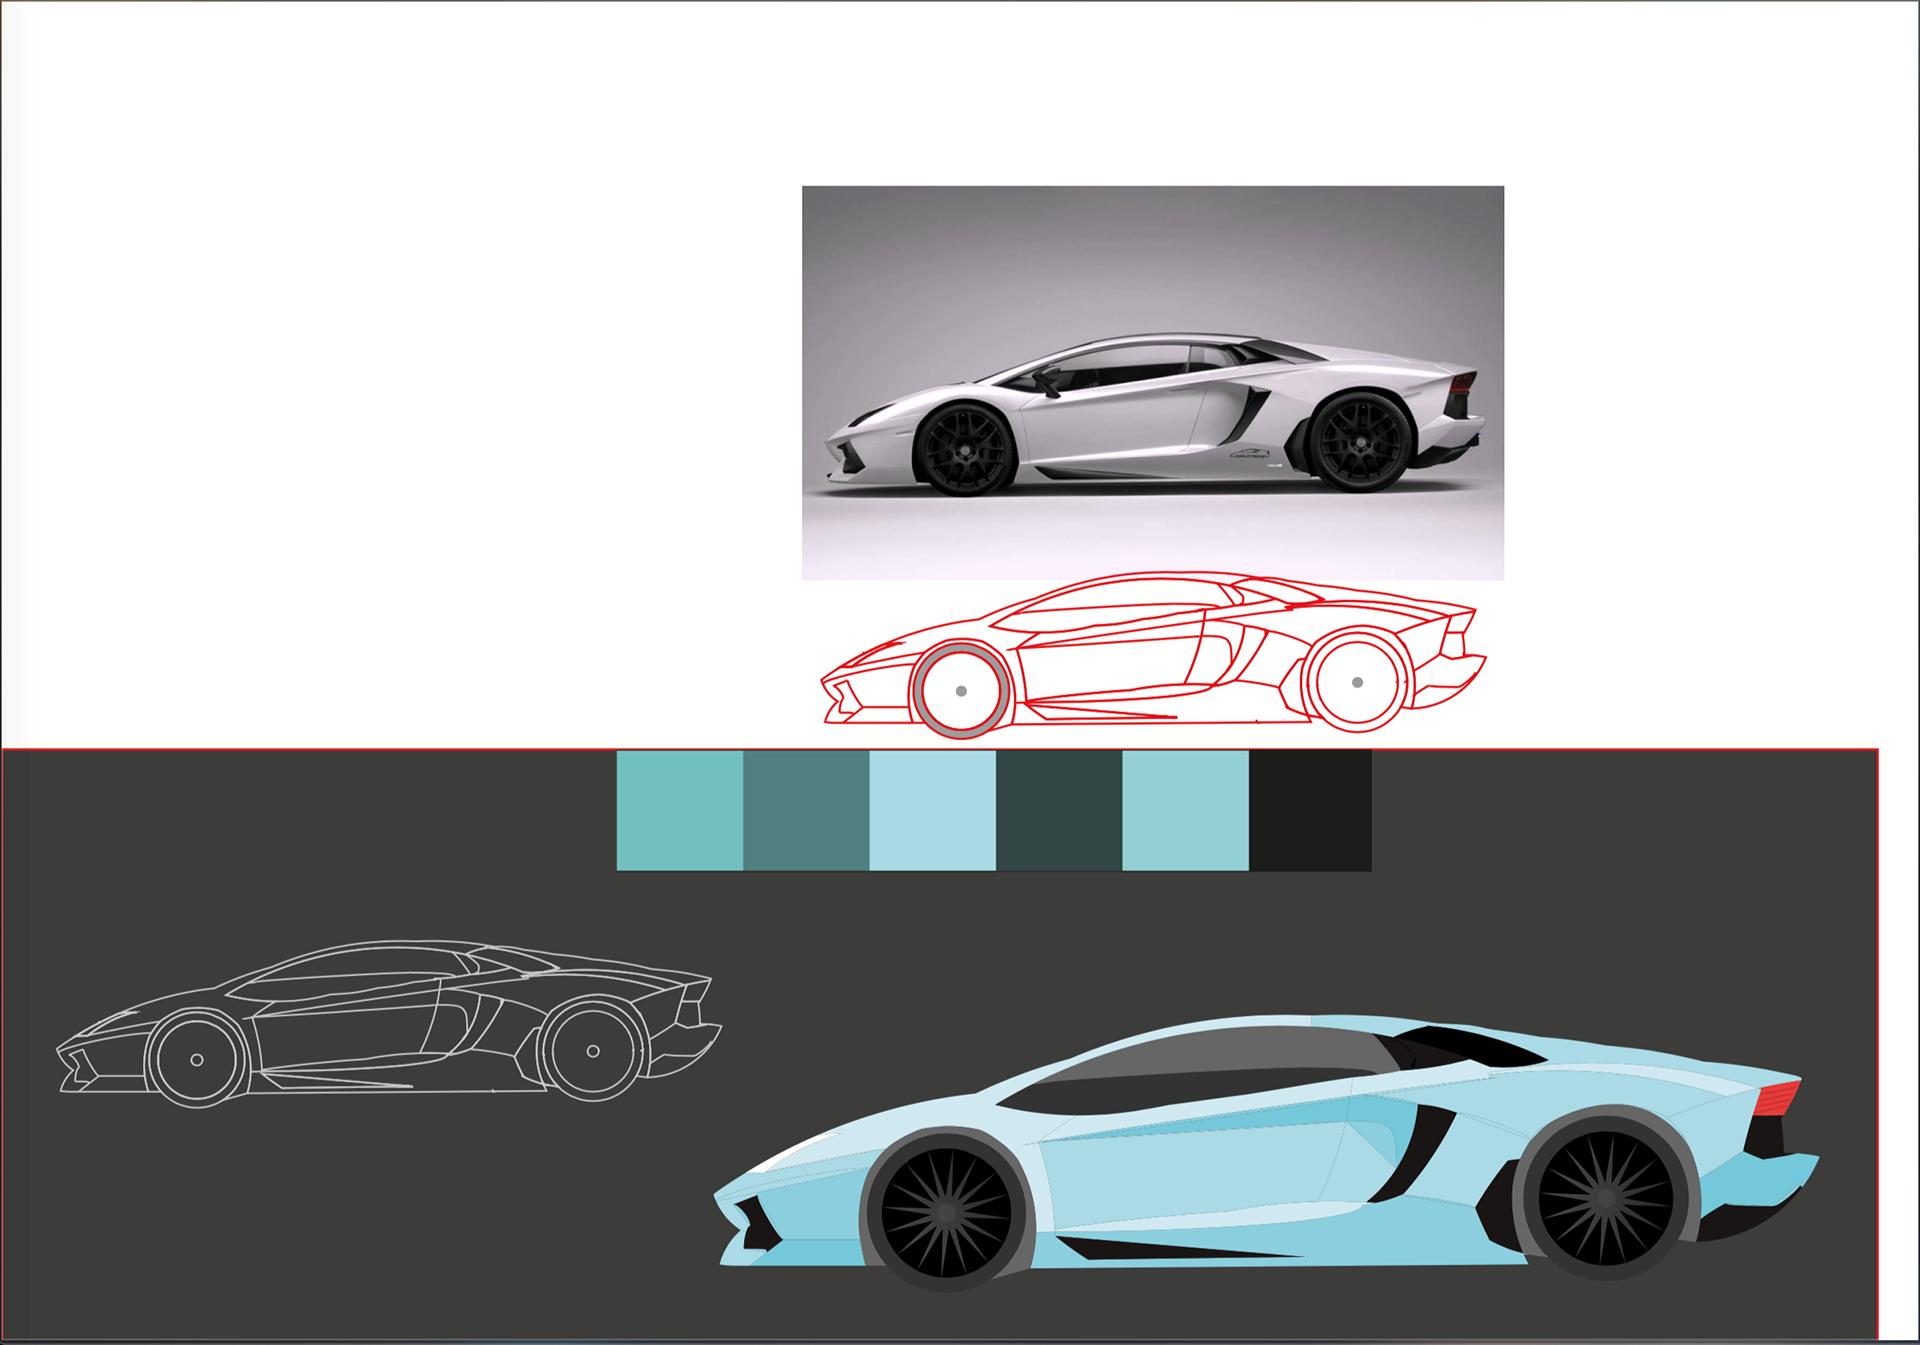 Martyna Starega Golden Ratio Design Lamborghini